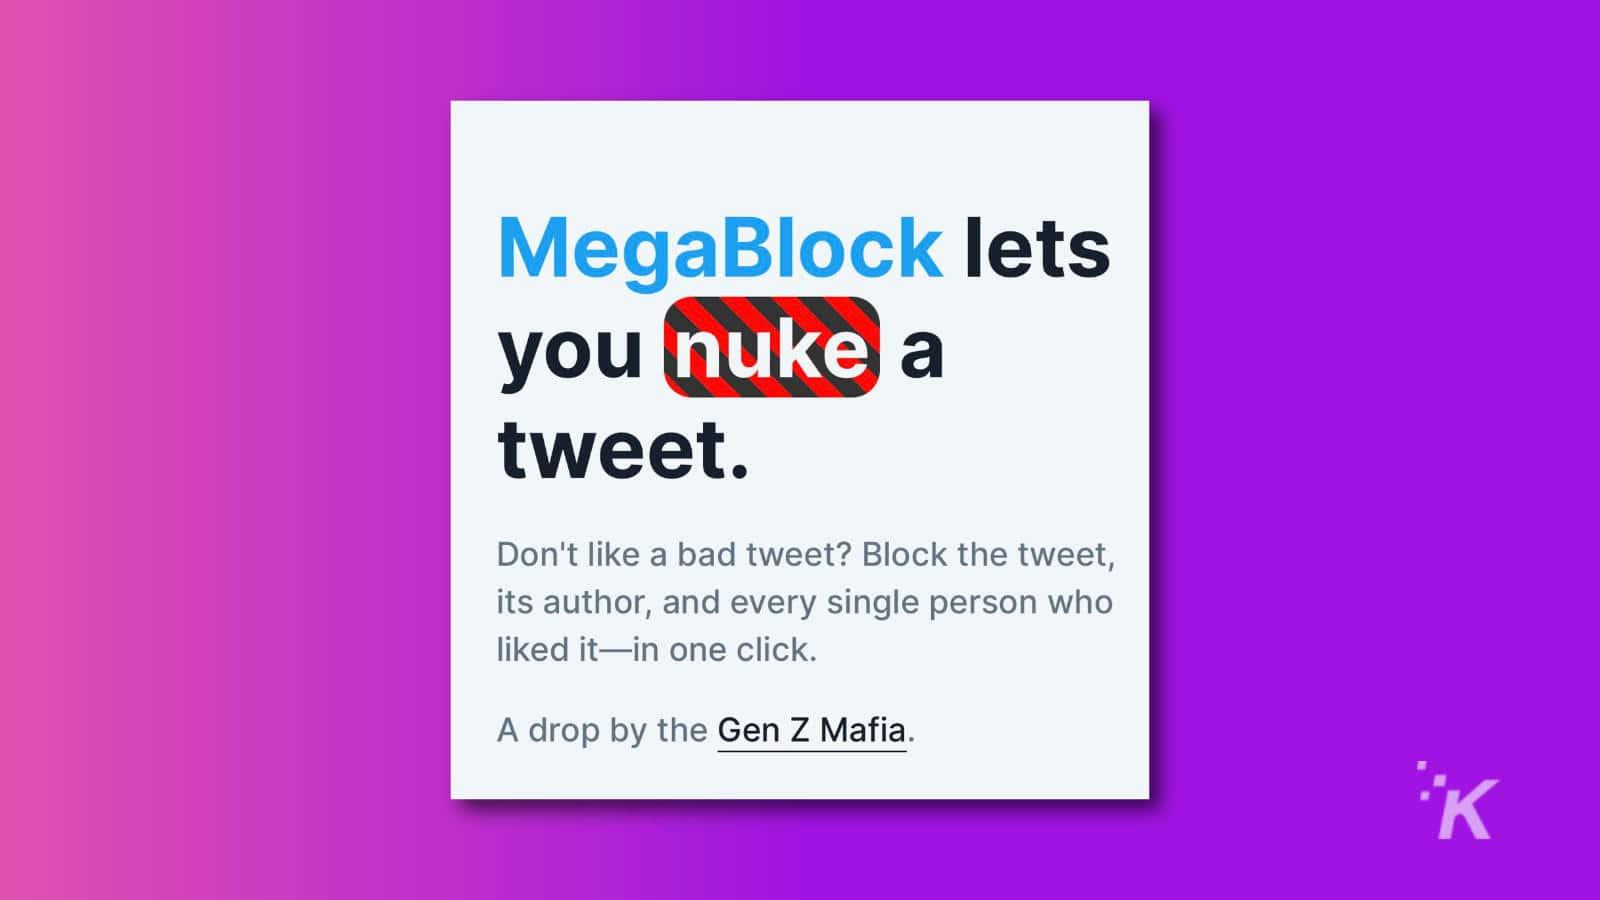 megablock from the gen z mafia